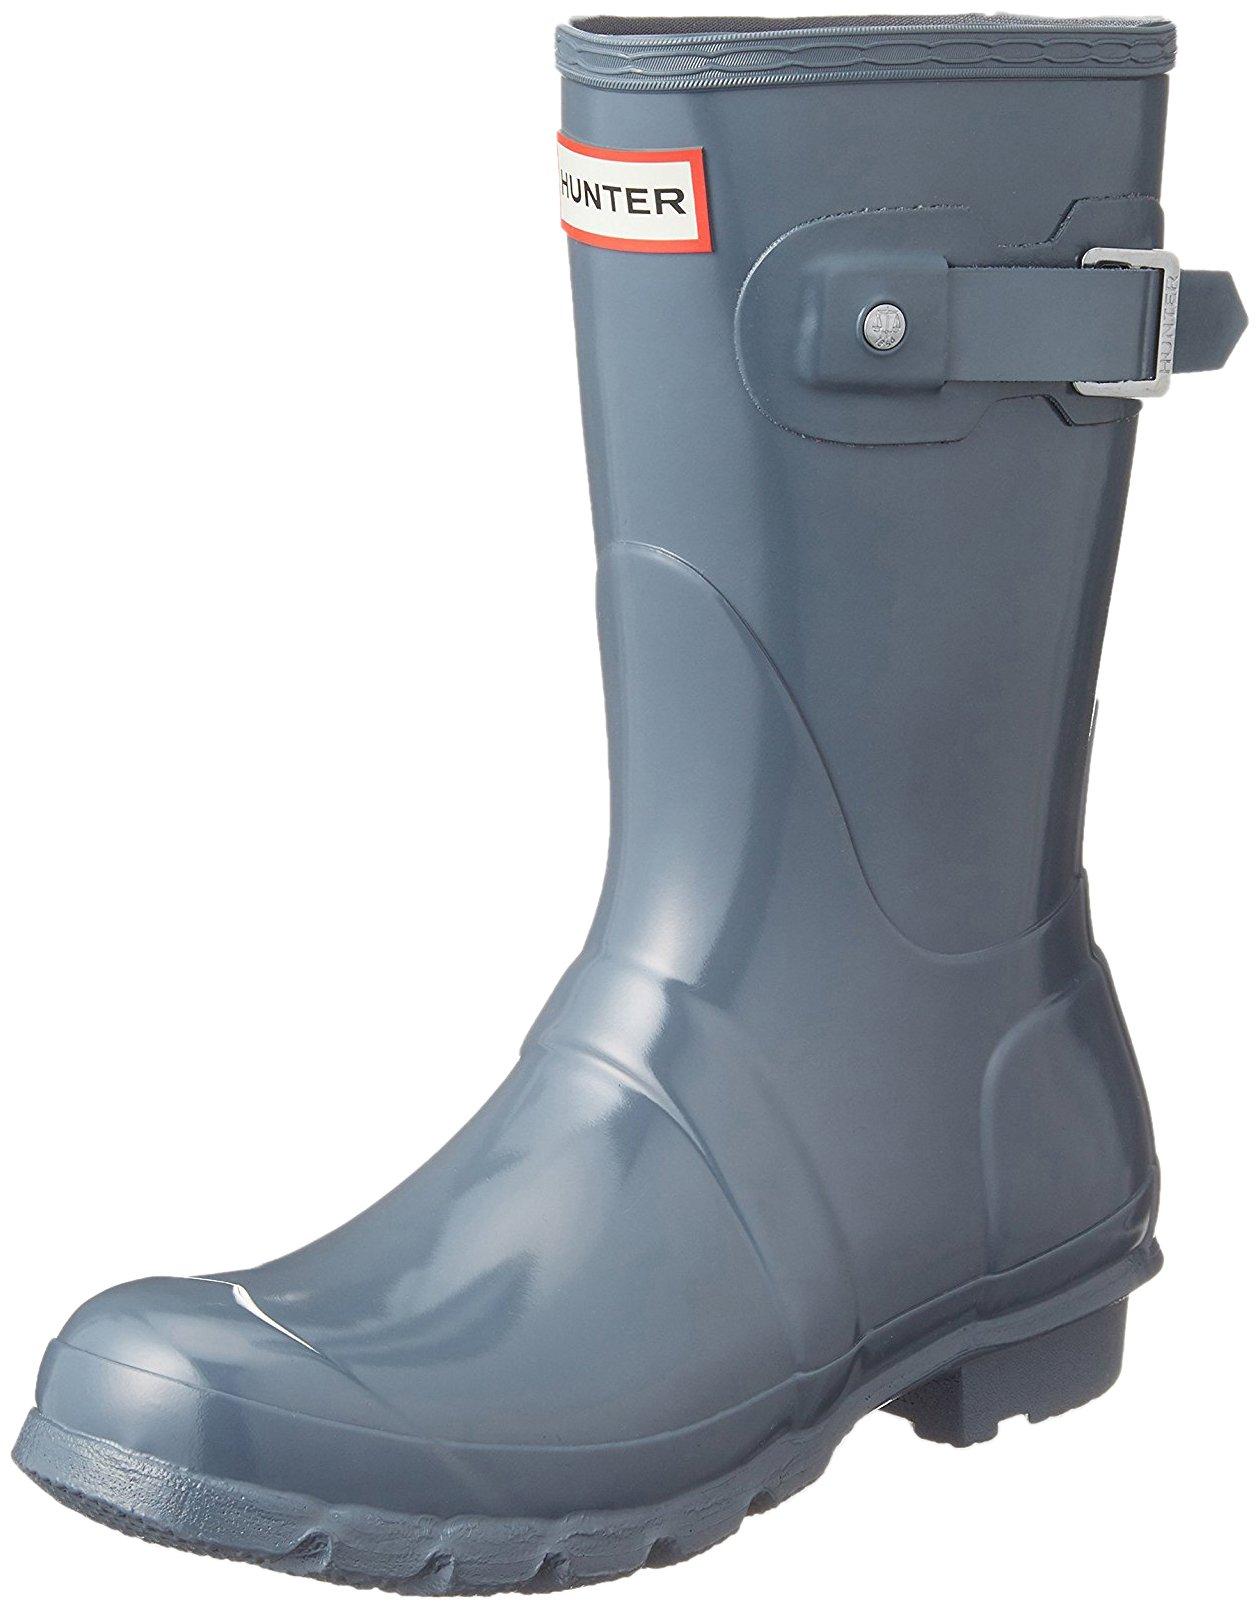 Hunter Women's Original Short Gloss Rain Boots, Graphite Gloss, 9 B(M) US